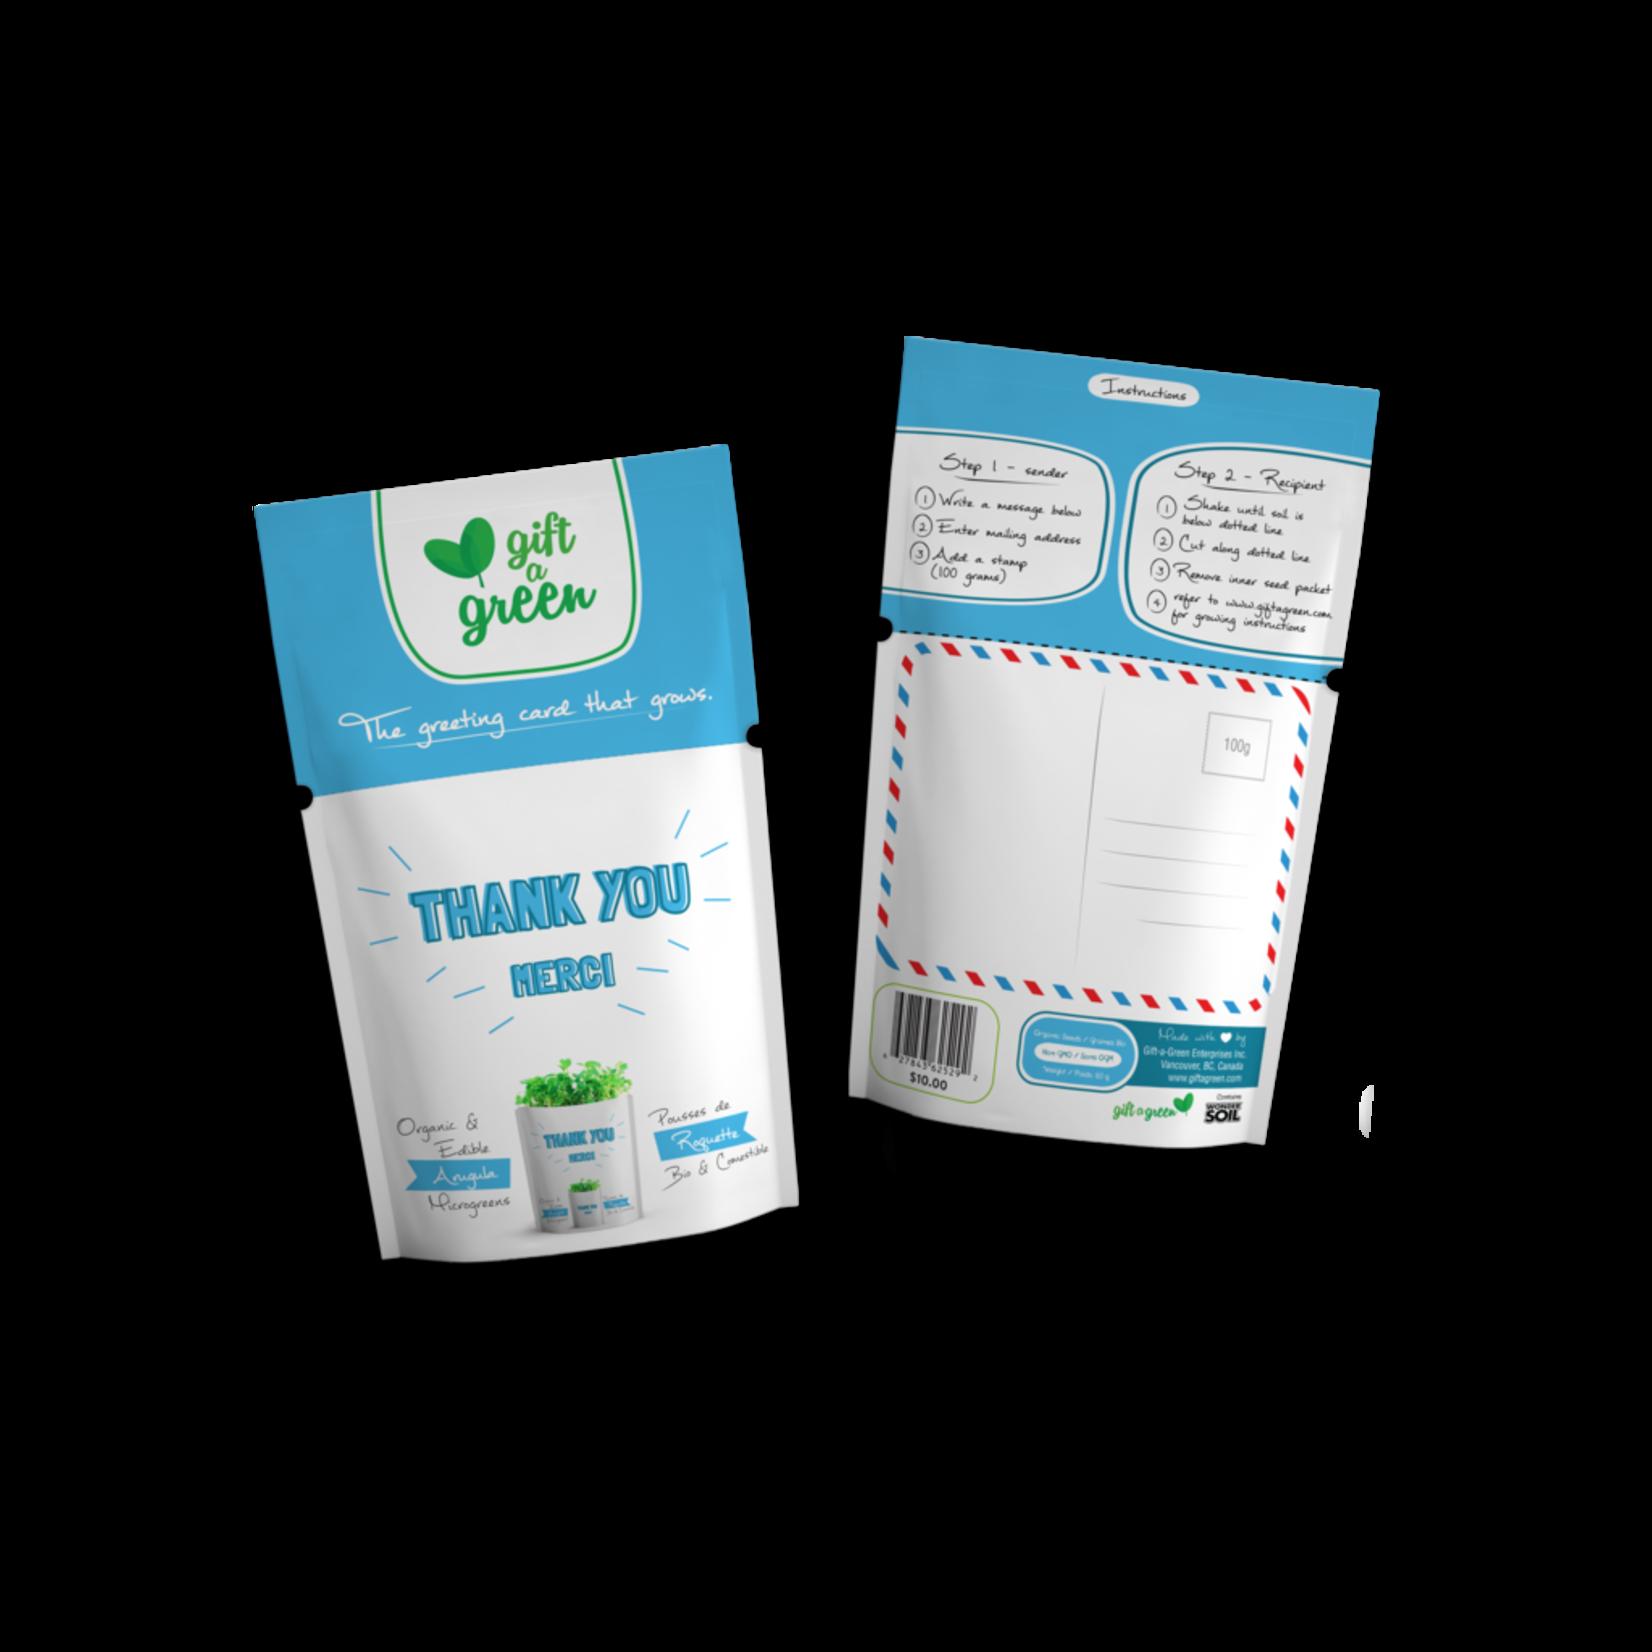 Gift A Green Microgreen Greeting Card Thank You- Arugula Microgreens